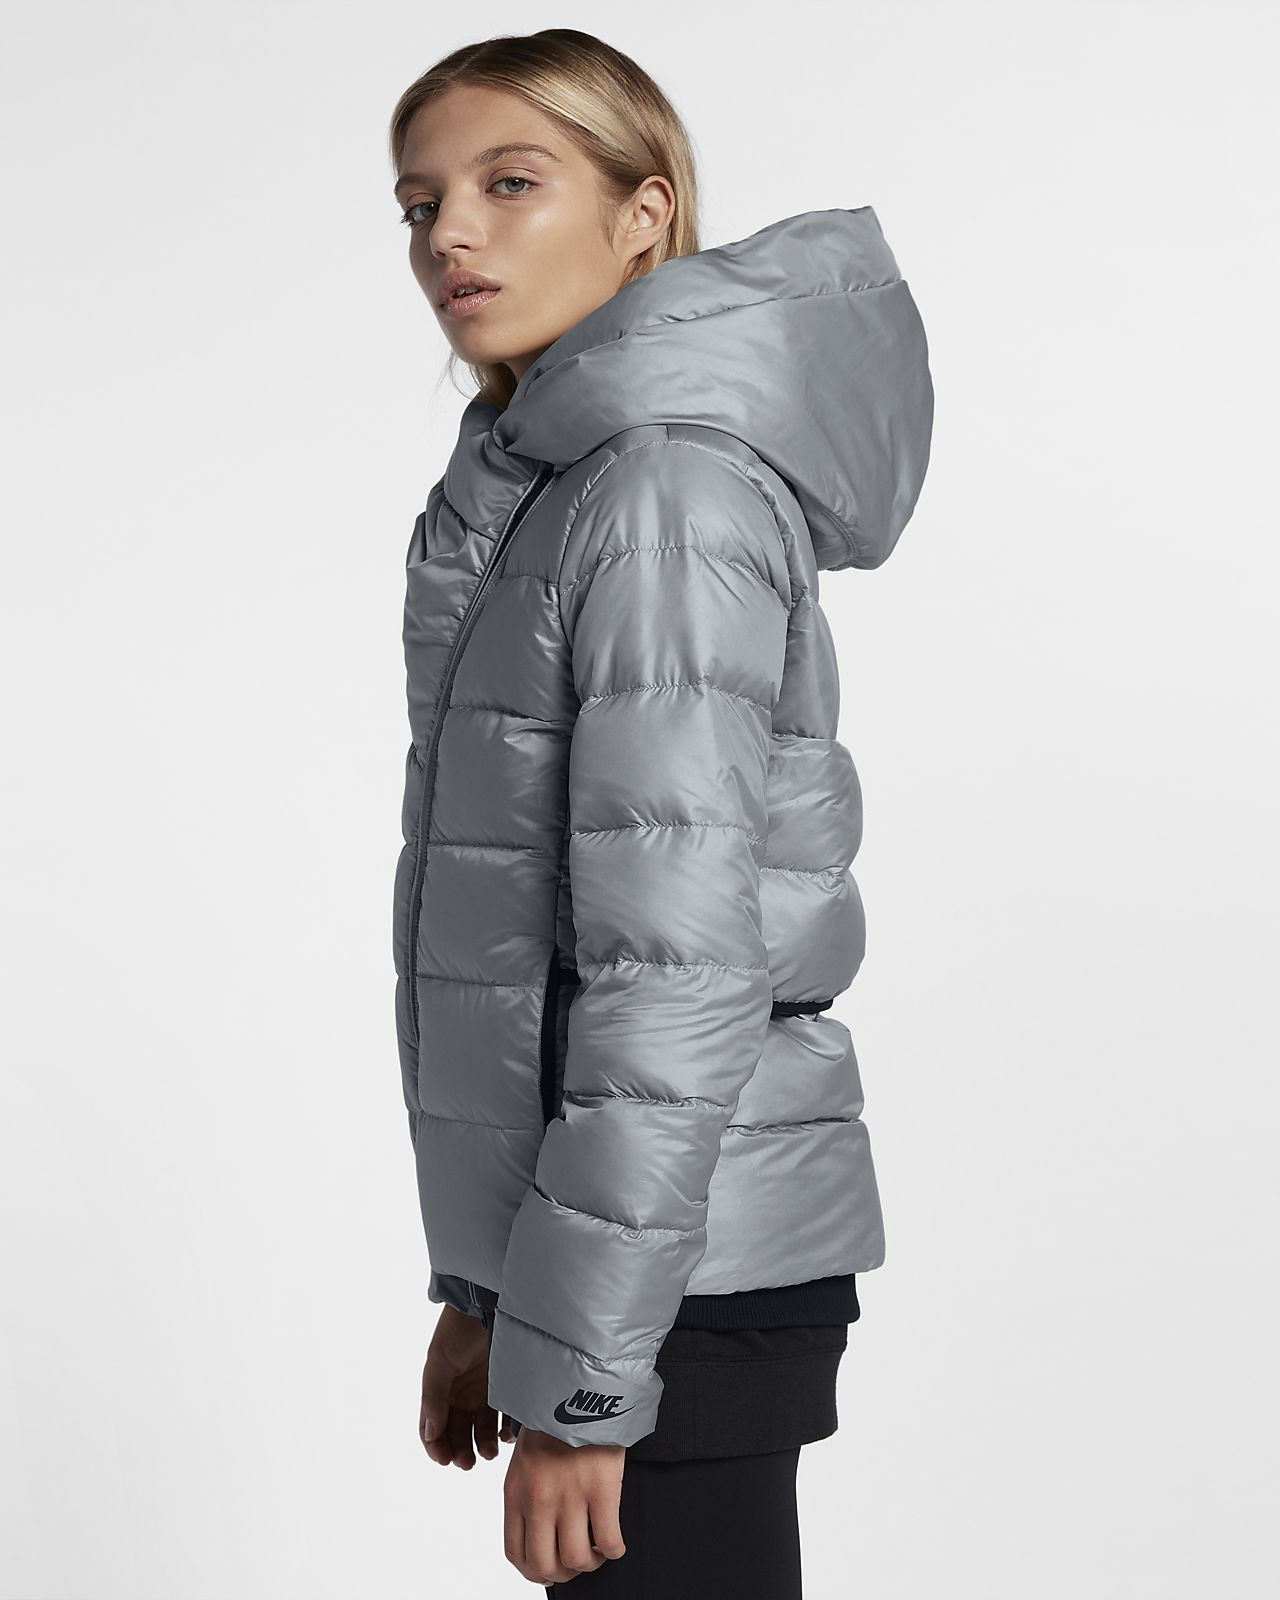 41d9328713 nike puffer jacket womens